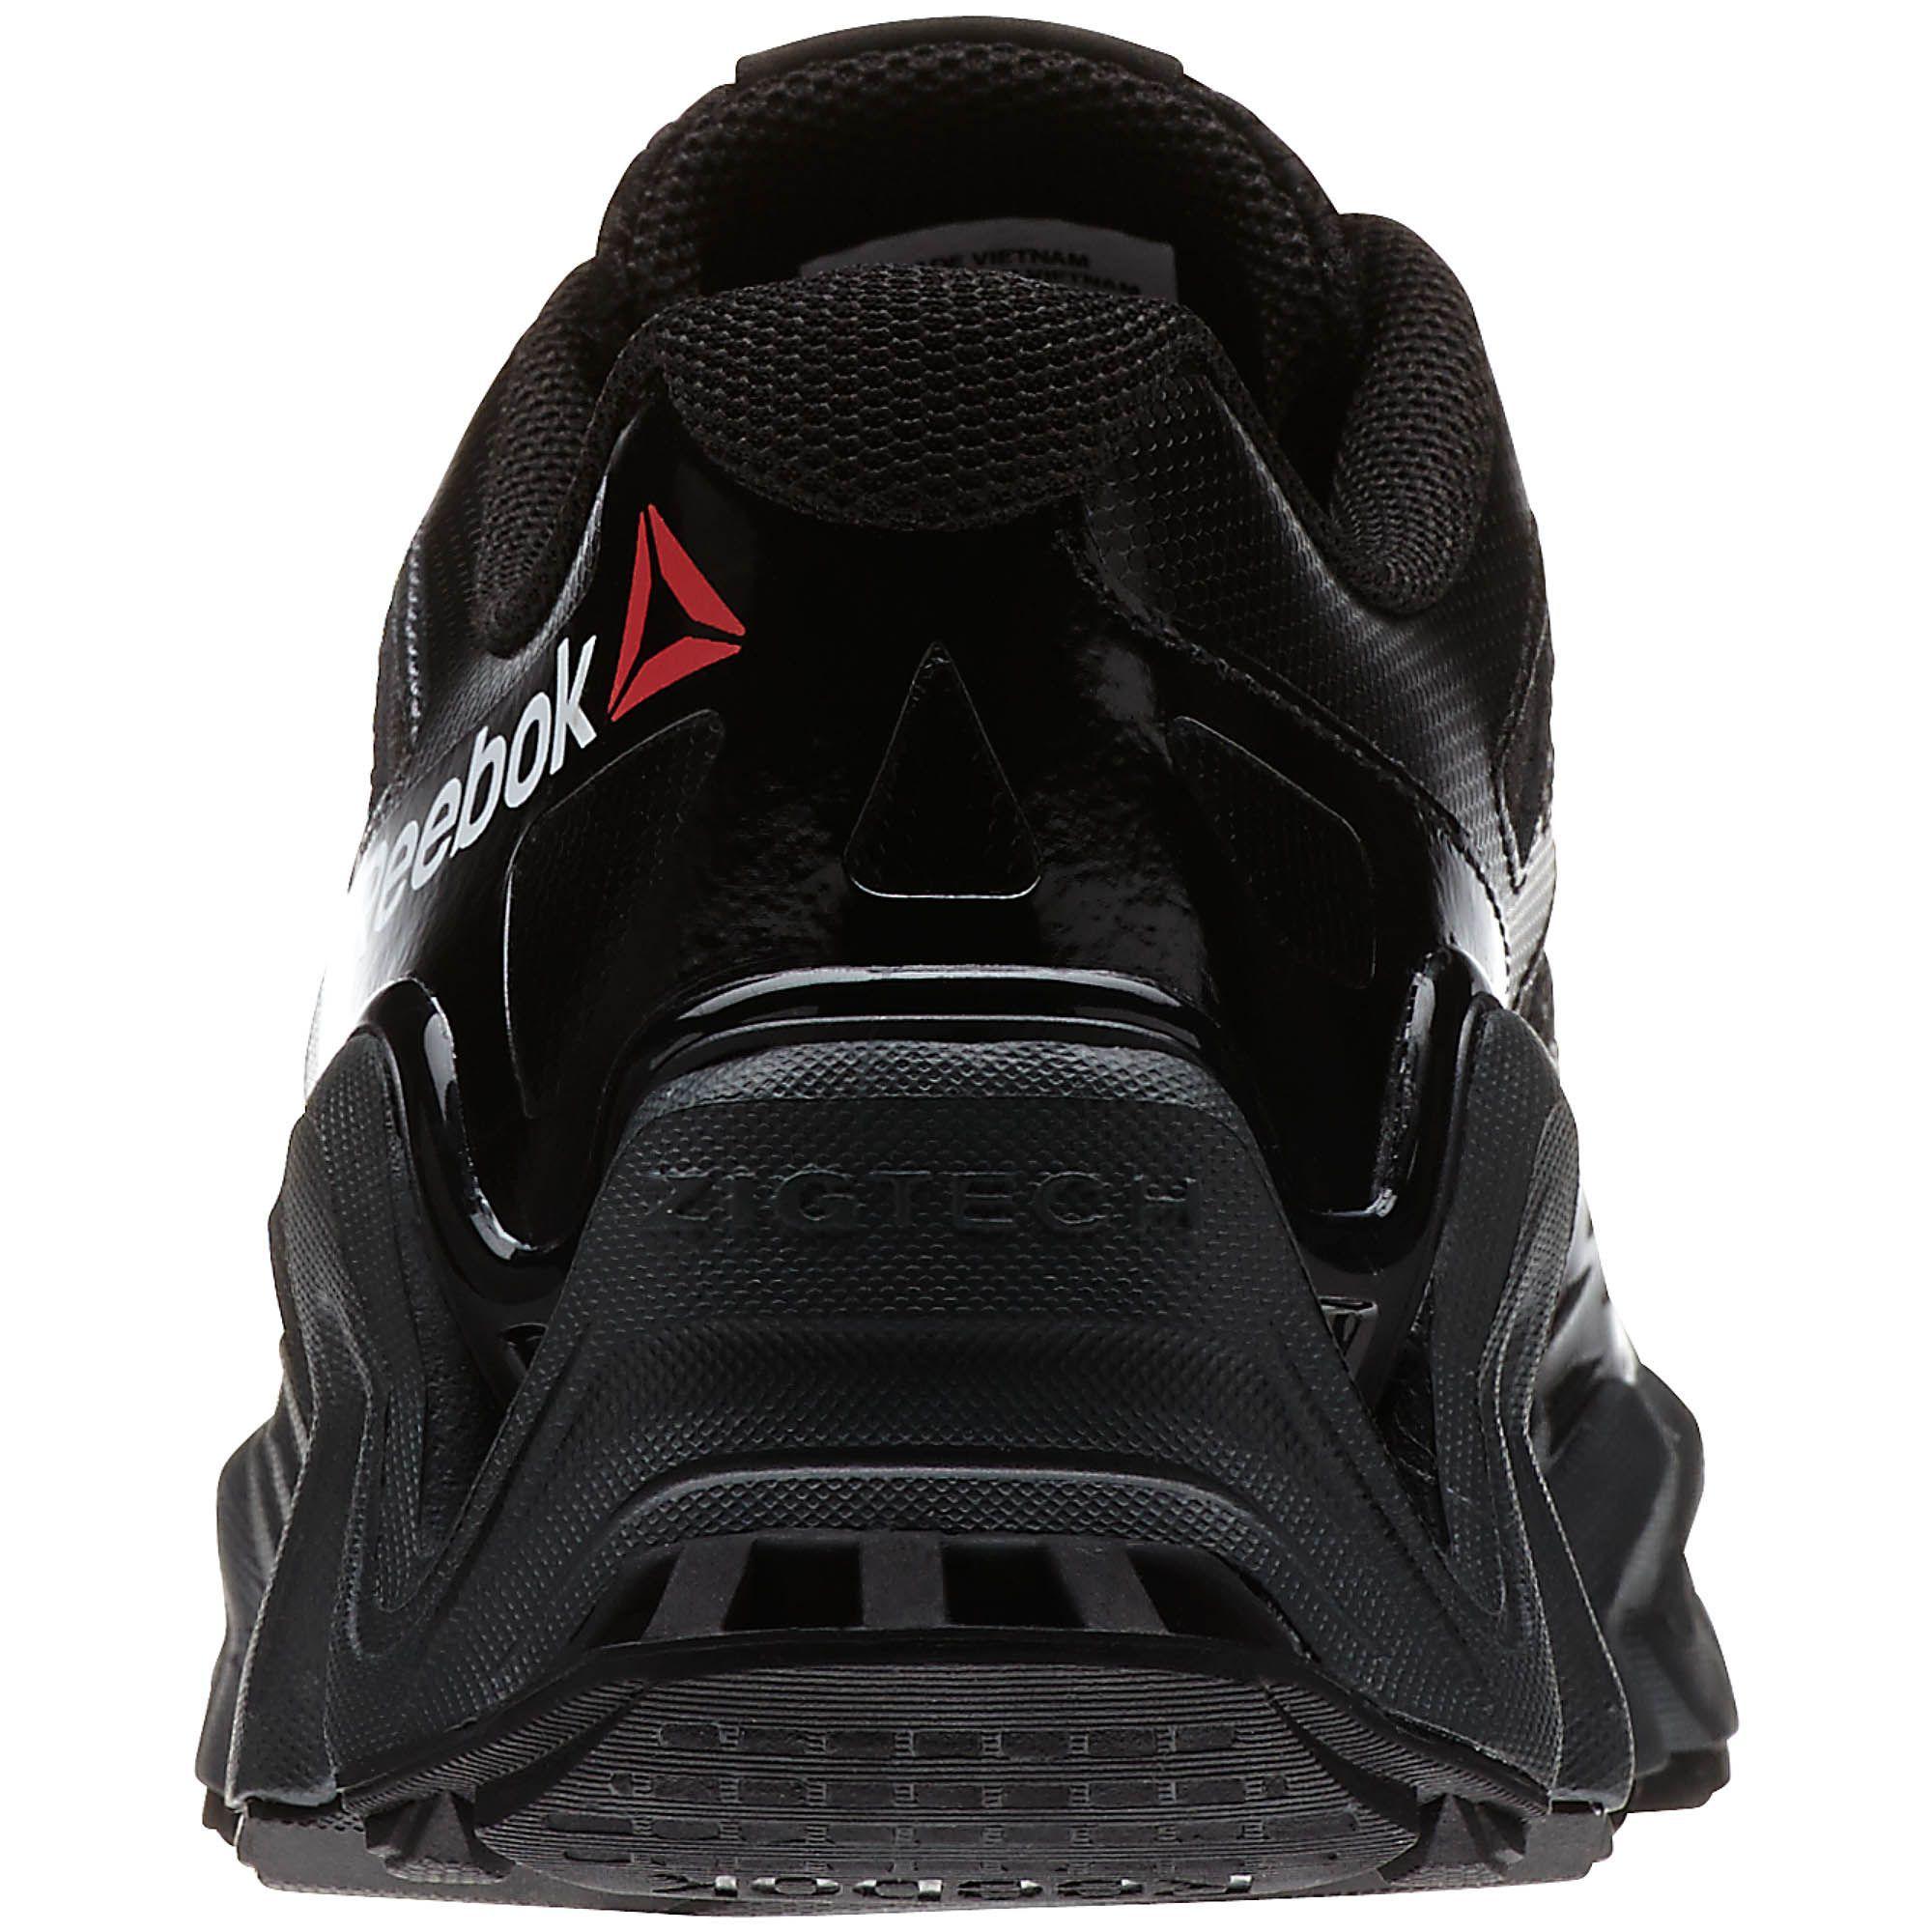 553f7debdf4e5 Reebok - ZigTech Big N Tough -   Sportswear (Nike, H/H, NF, etc ...